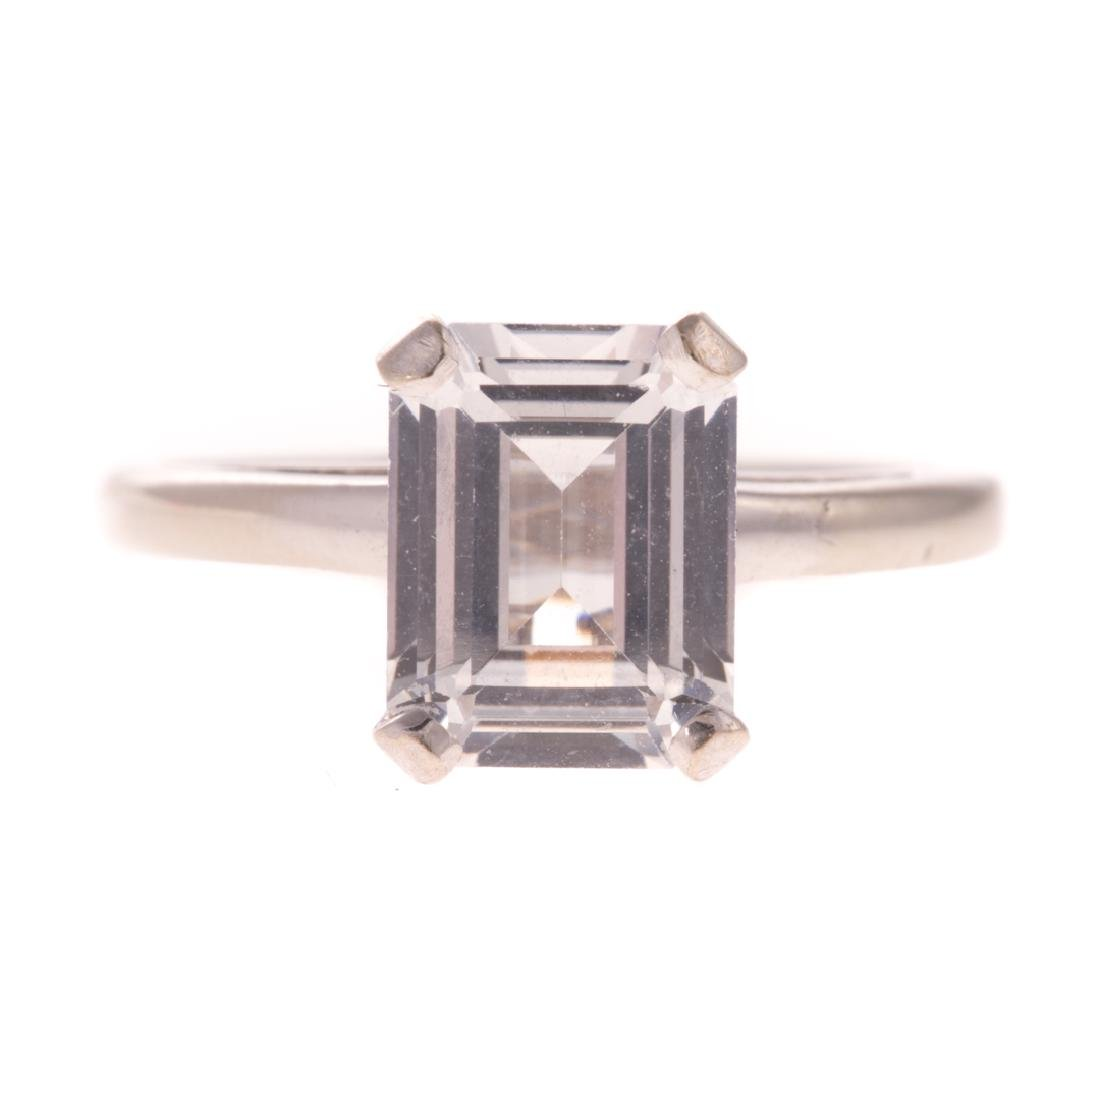 A Lady's 14K Emerald Cut White Sapphire Ring